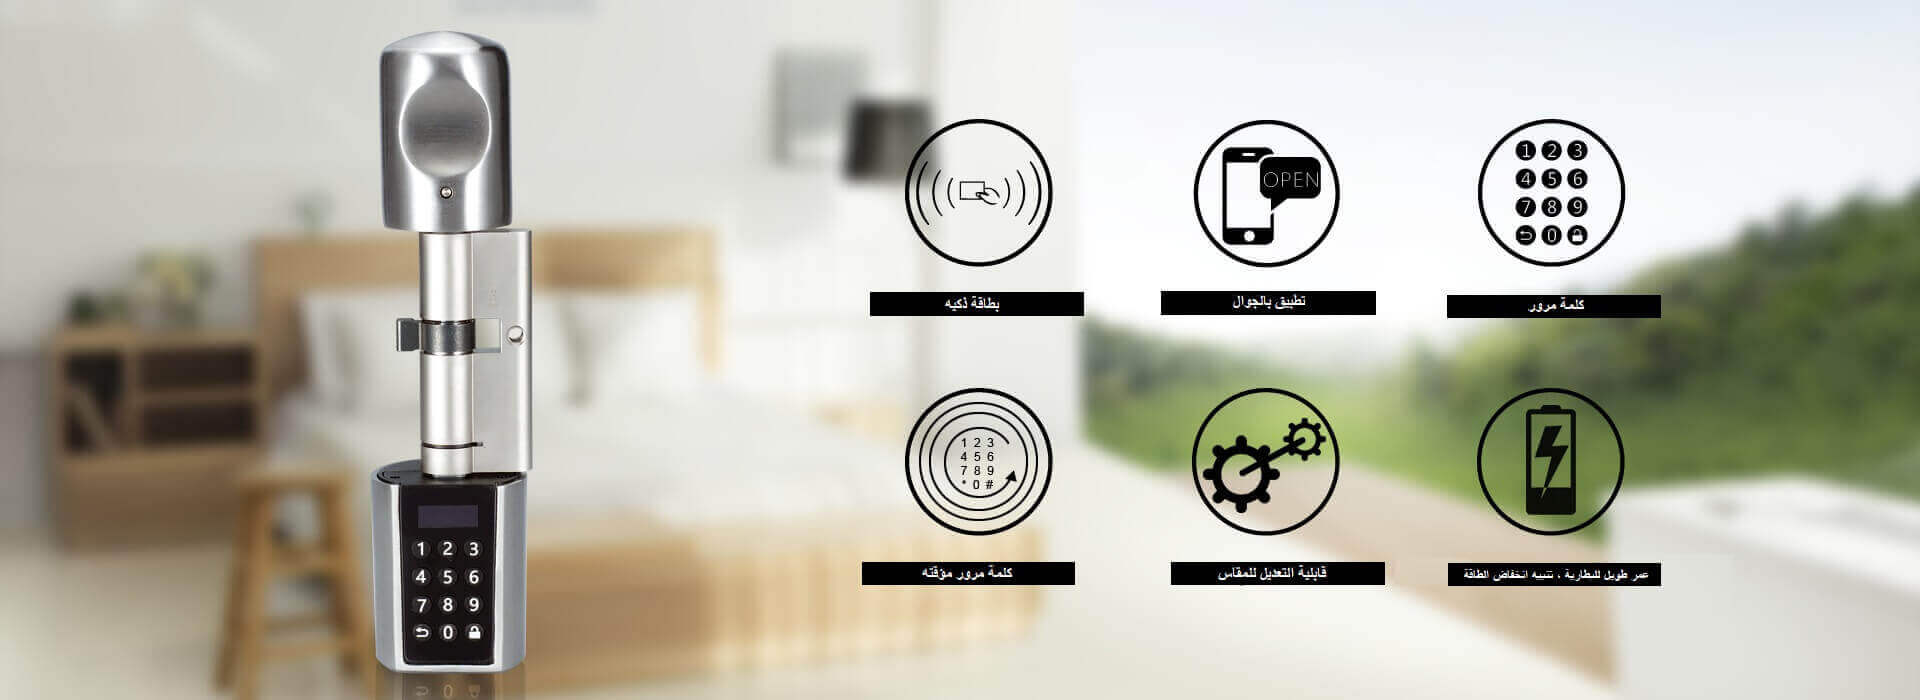 L6PCB هو قفل باب ذكي بطرق فتح متعددة عن طريق الرقم السري والكروت و تطبيق الجوال